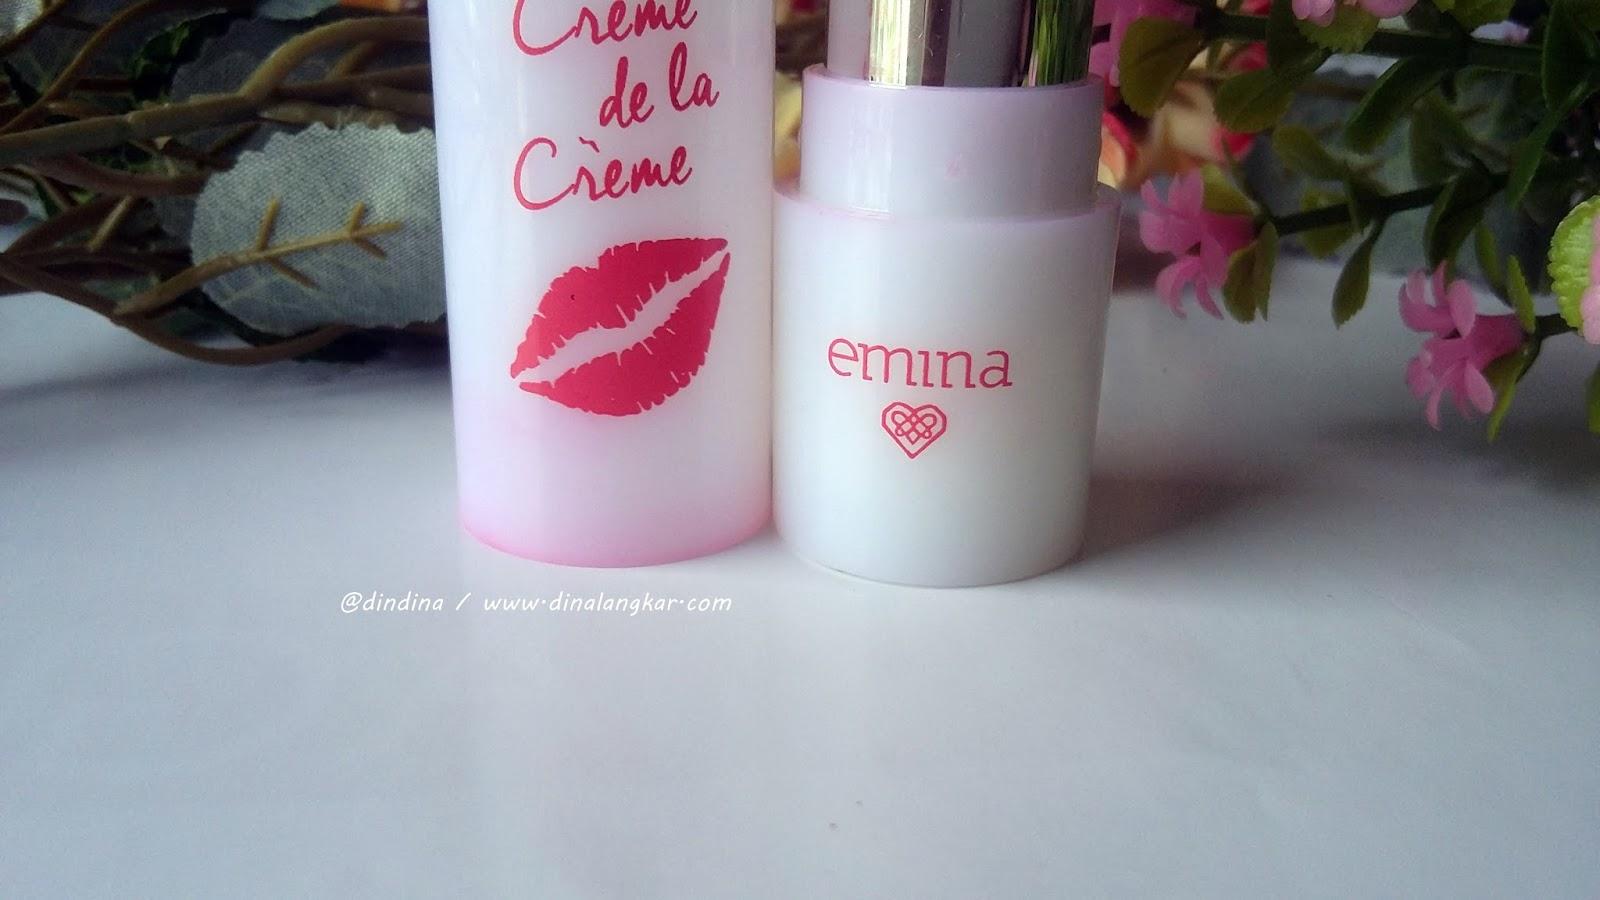 Emina Cream de la cream (Review) - Mawar Berduri